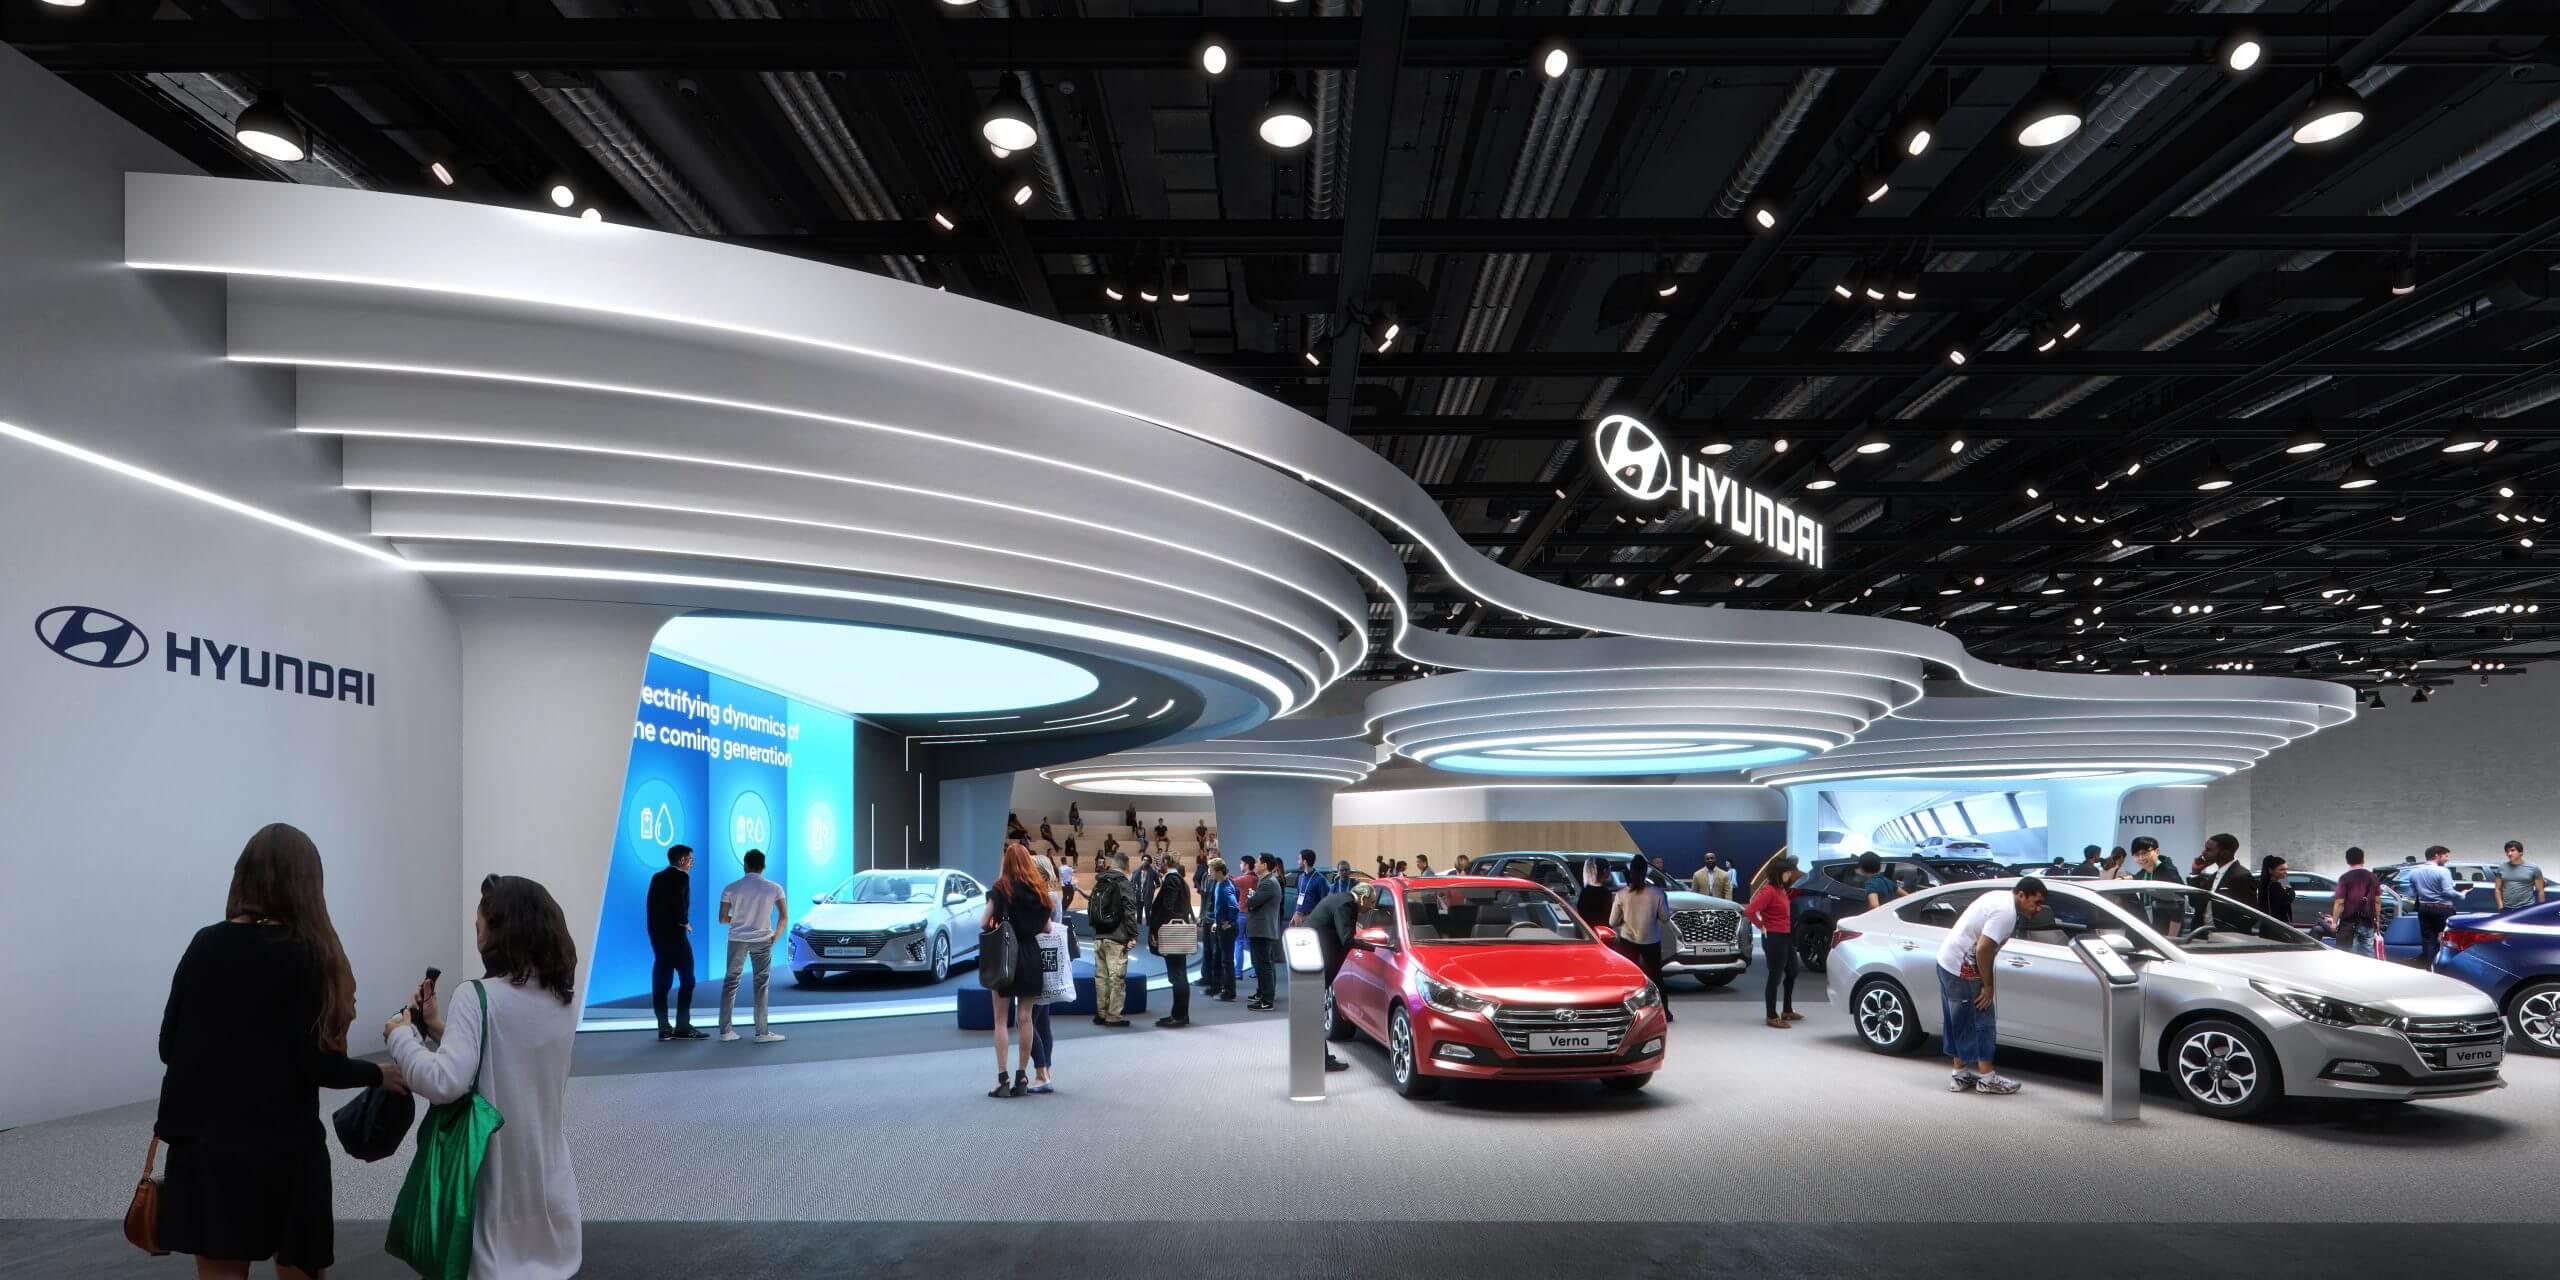 Hyundai_EXHIB_Brandlab_Crystalline